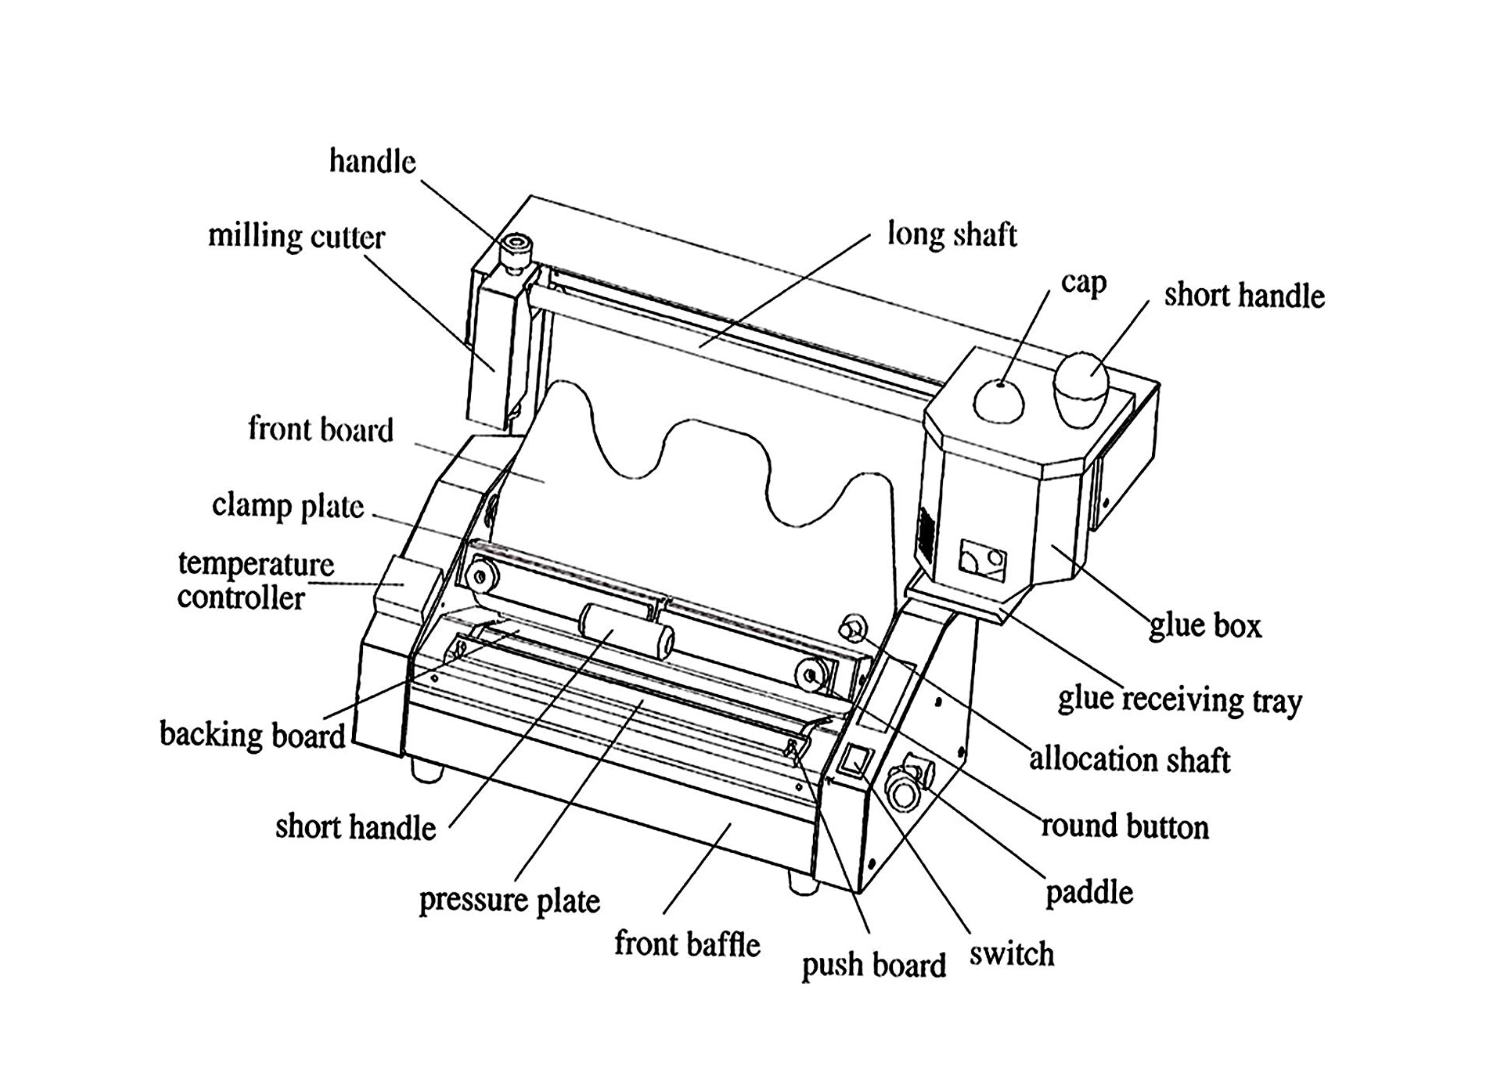 book binding machine details